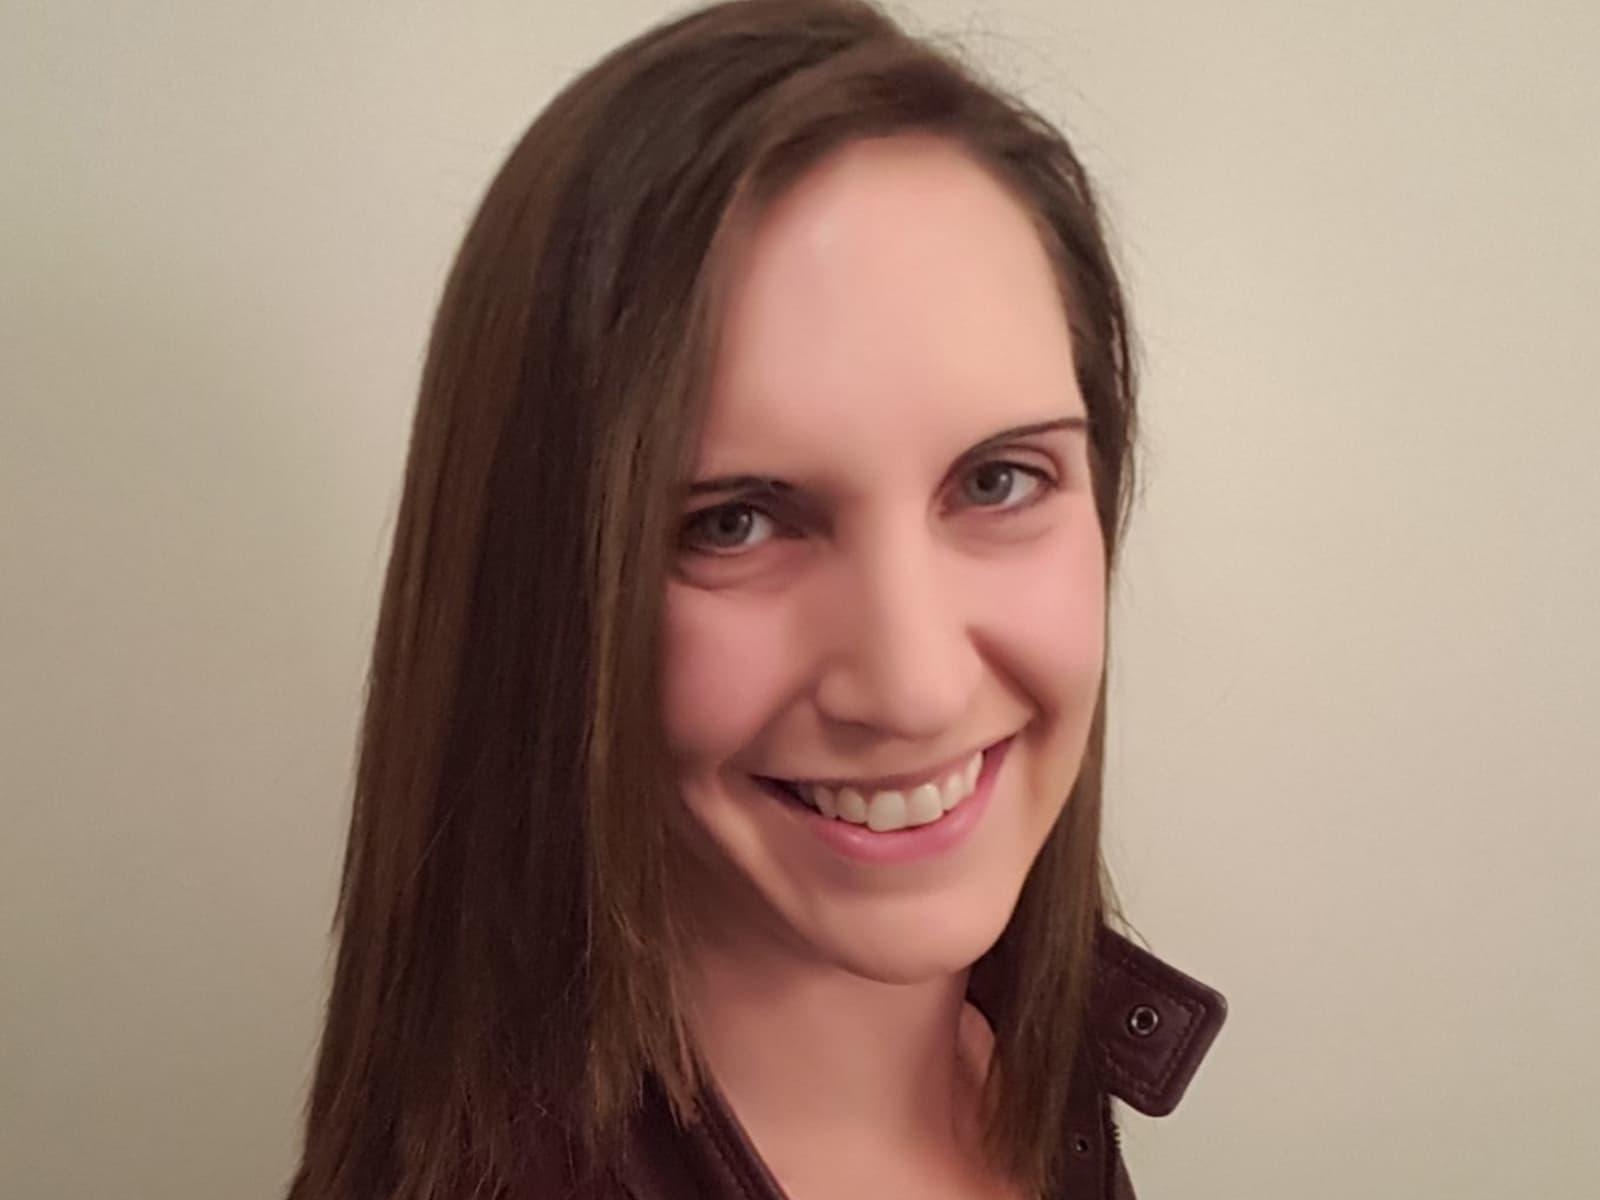 Lesley from Portland, Oregon, United States